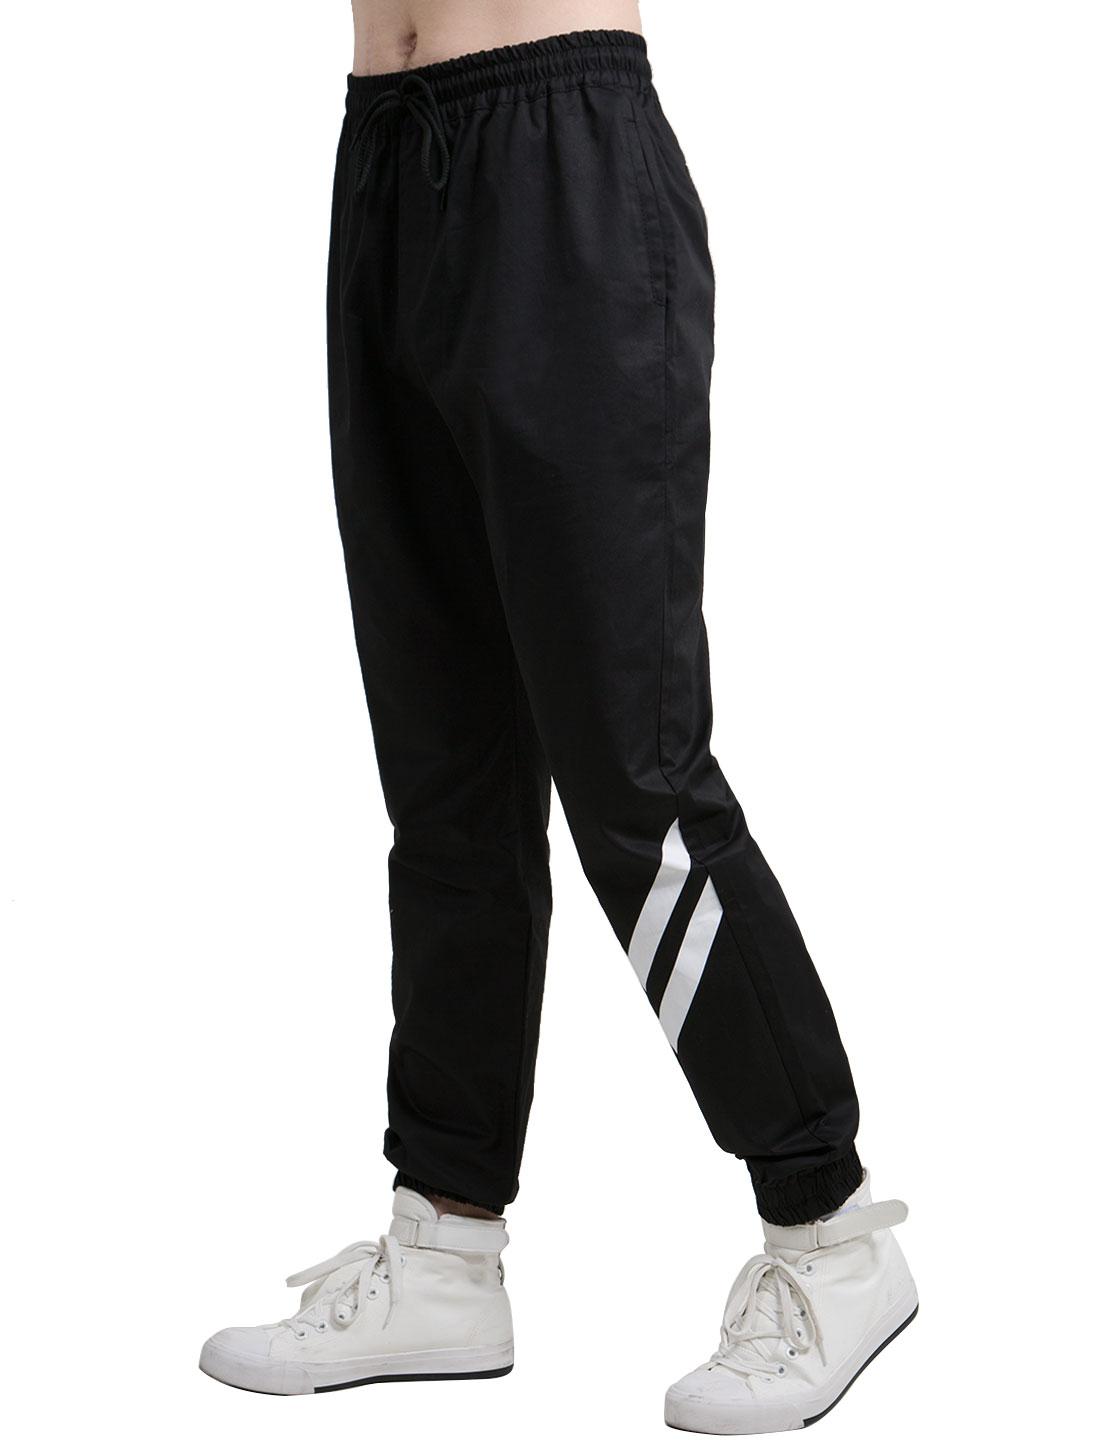 Men Arrows Pattern Drawstring Stretch Elastic Waist Sweatpants Black W36